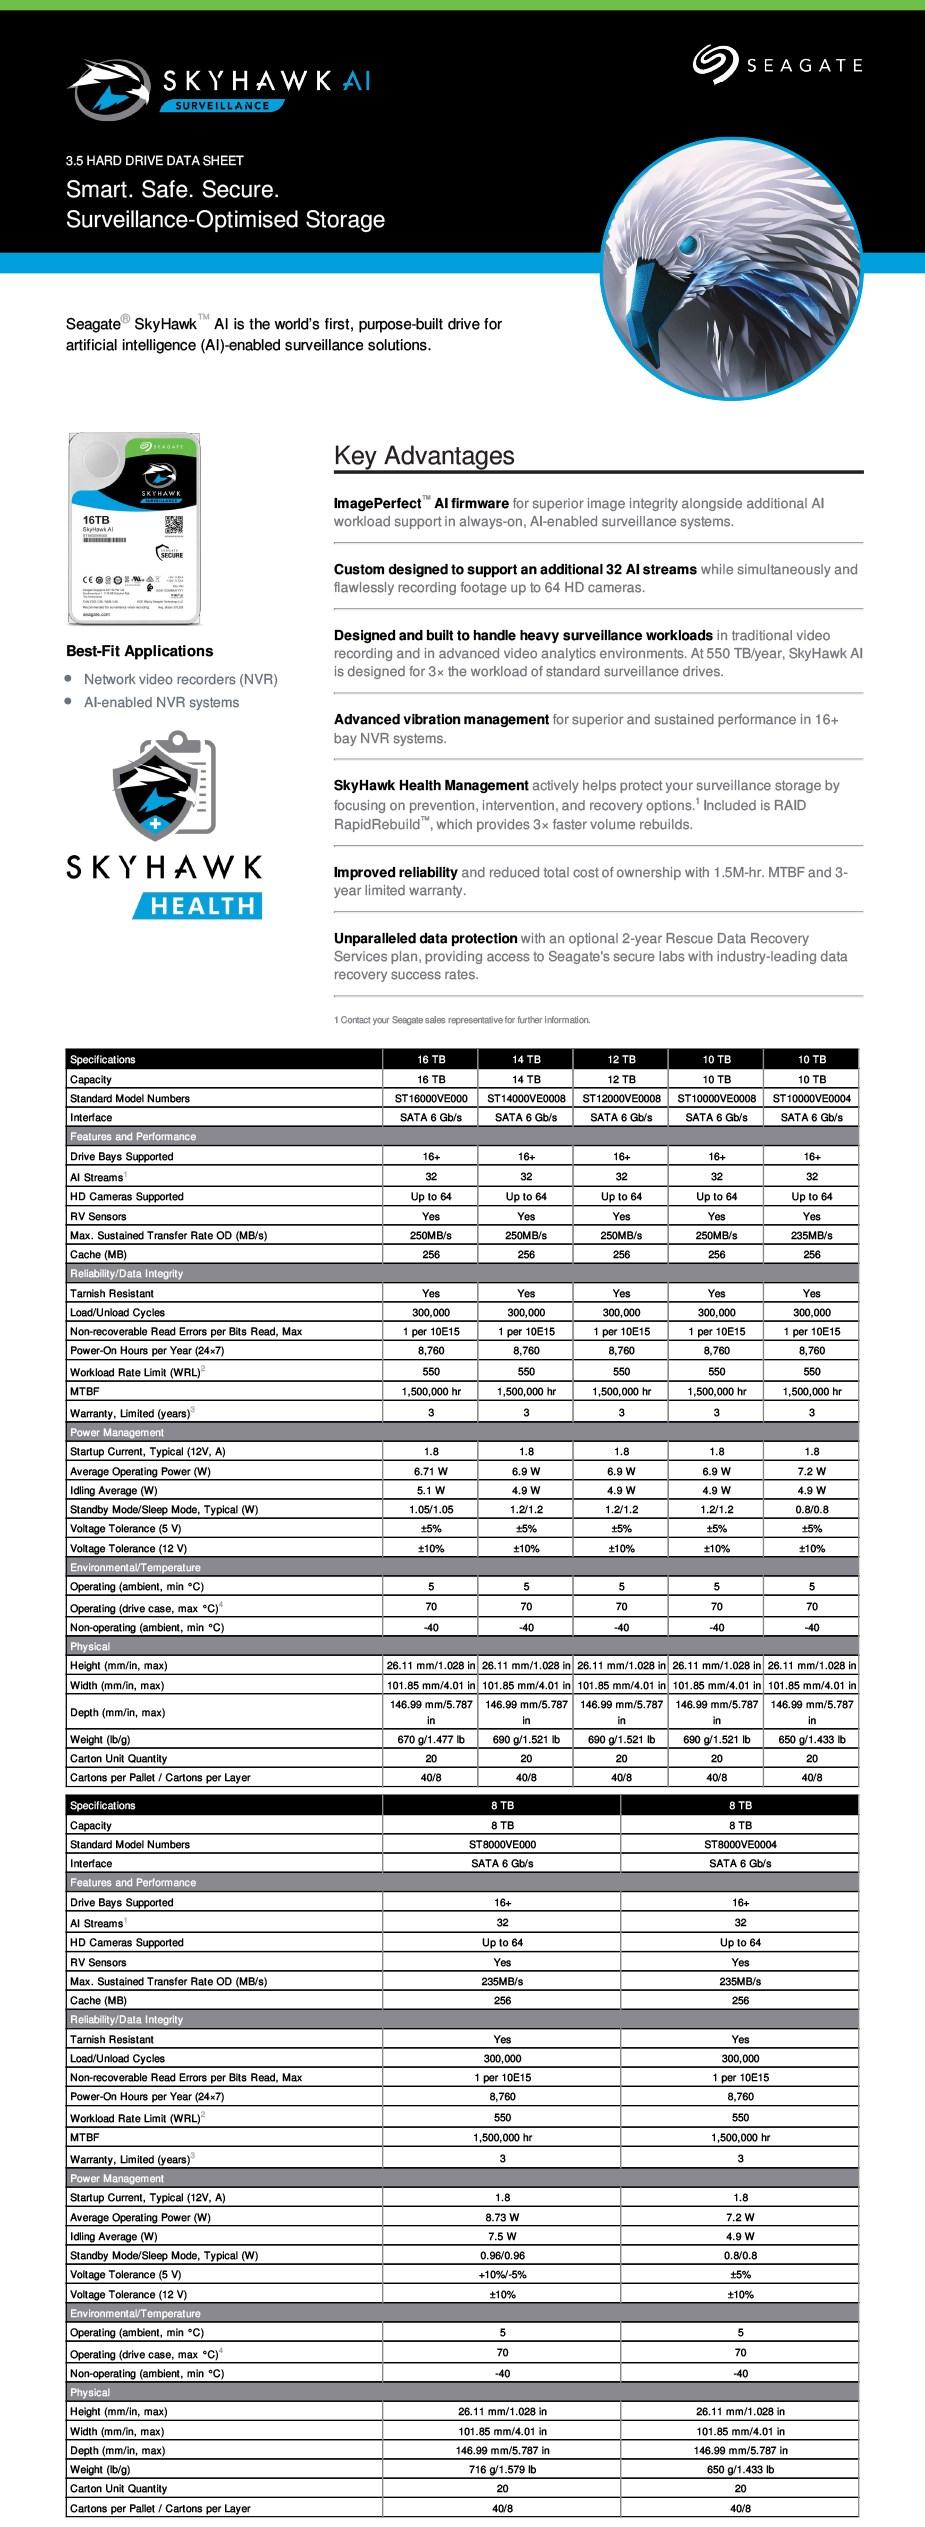 "Seagate ST16000VE000 16TB SkyHawk AI 3.5"" Surveillance Hard Drive - Overview 2"